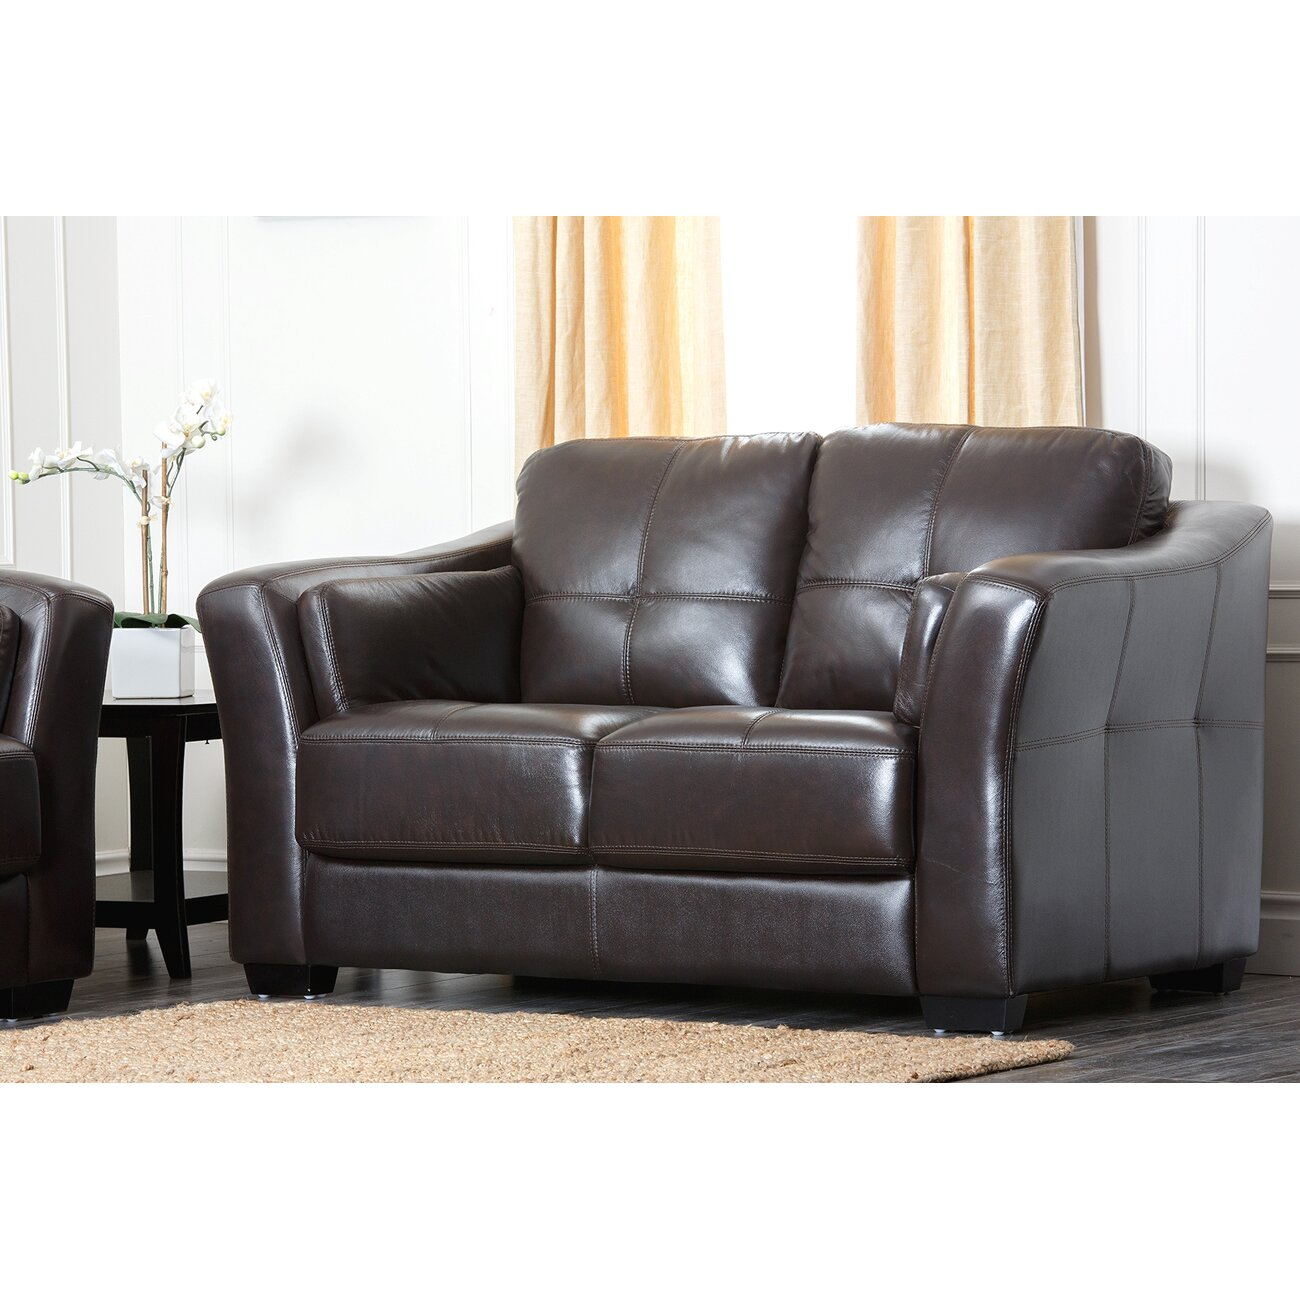 Leather Sofa Sydney: Abbyson Living Sydney Premium Leather Loveseat & Reviews